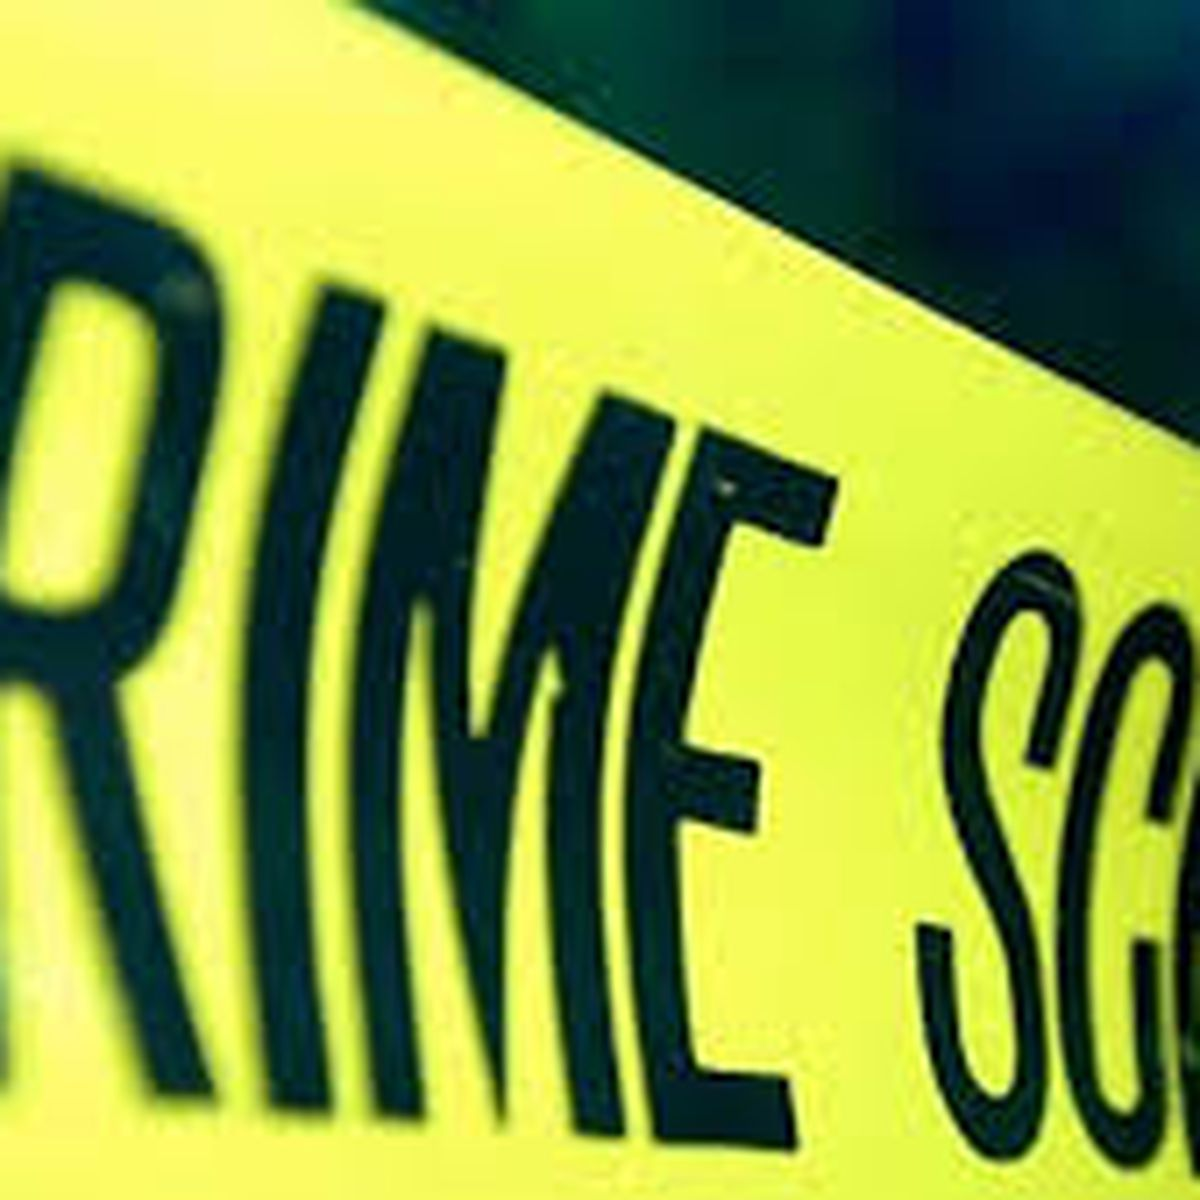 Columbus police investigating homicide at Circle K on Forrest Rd.